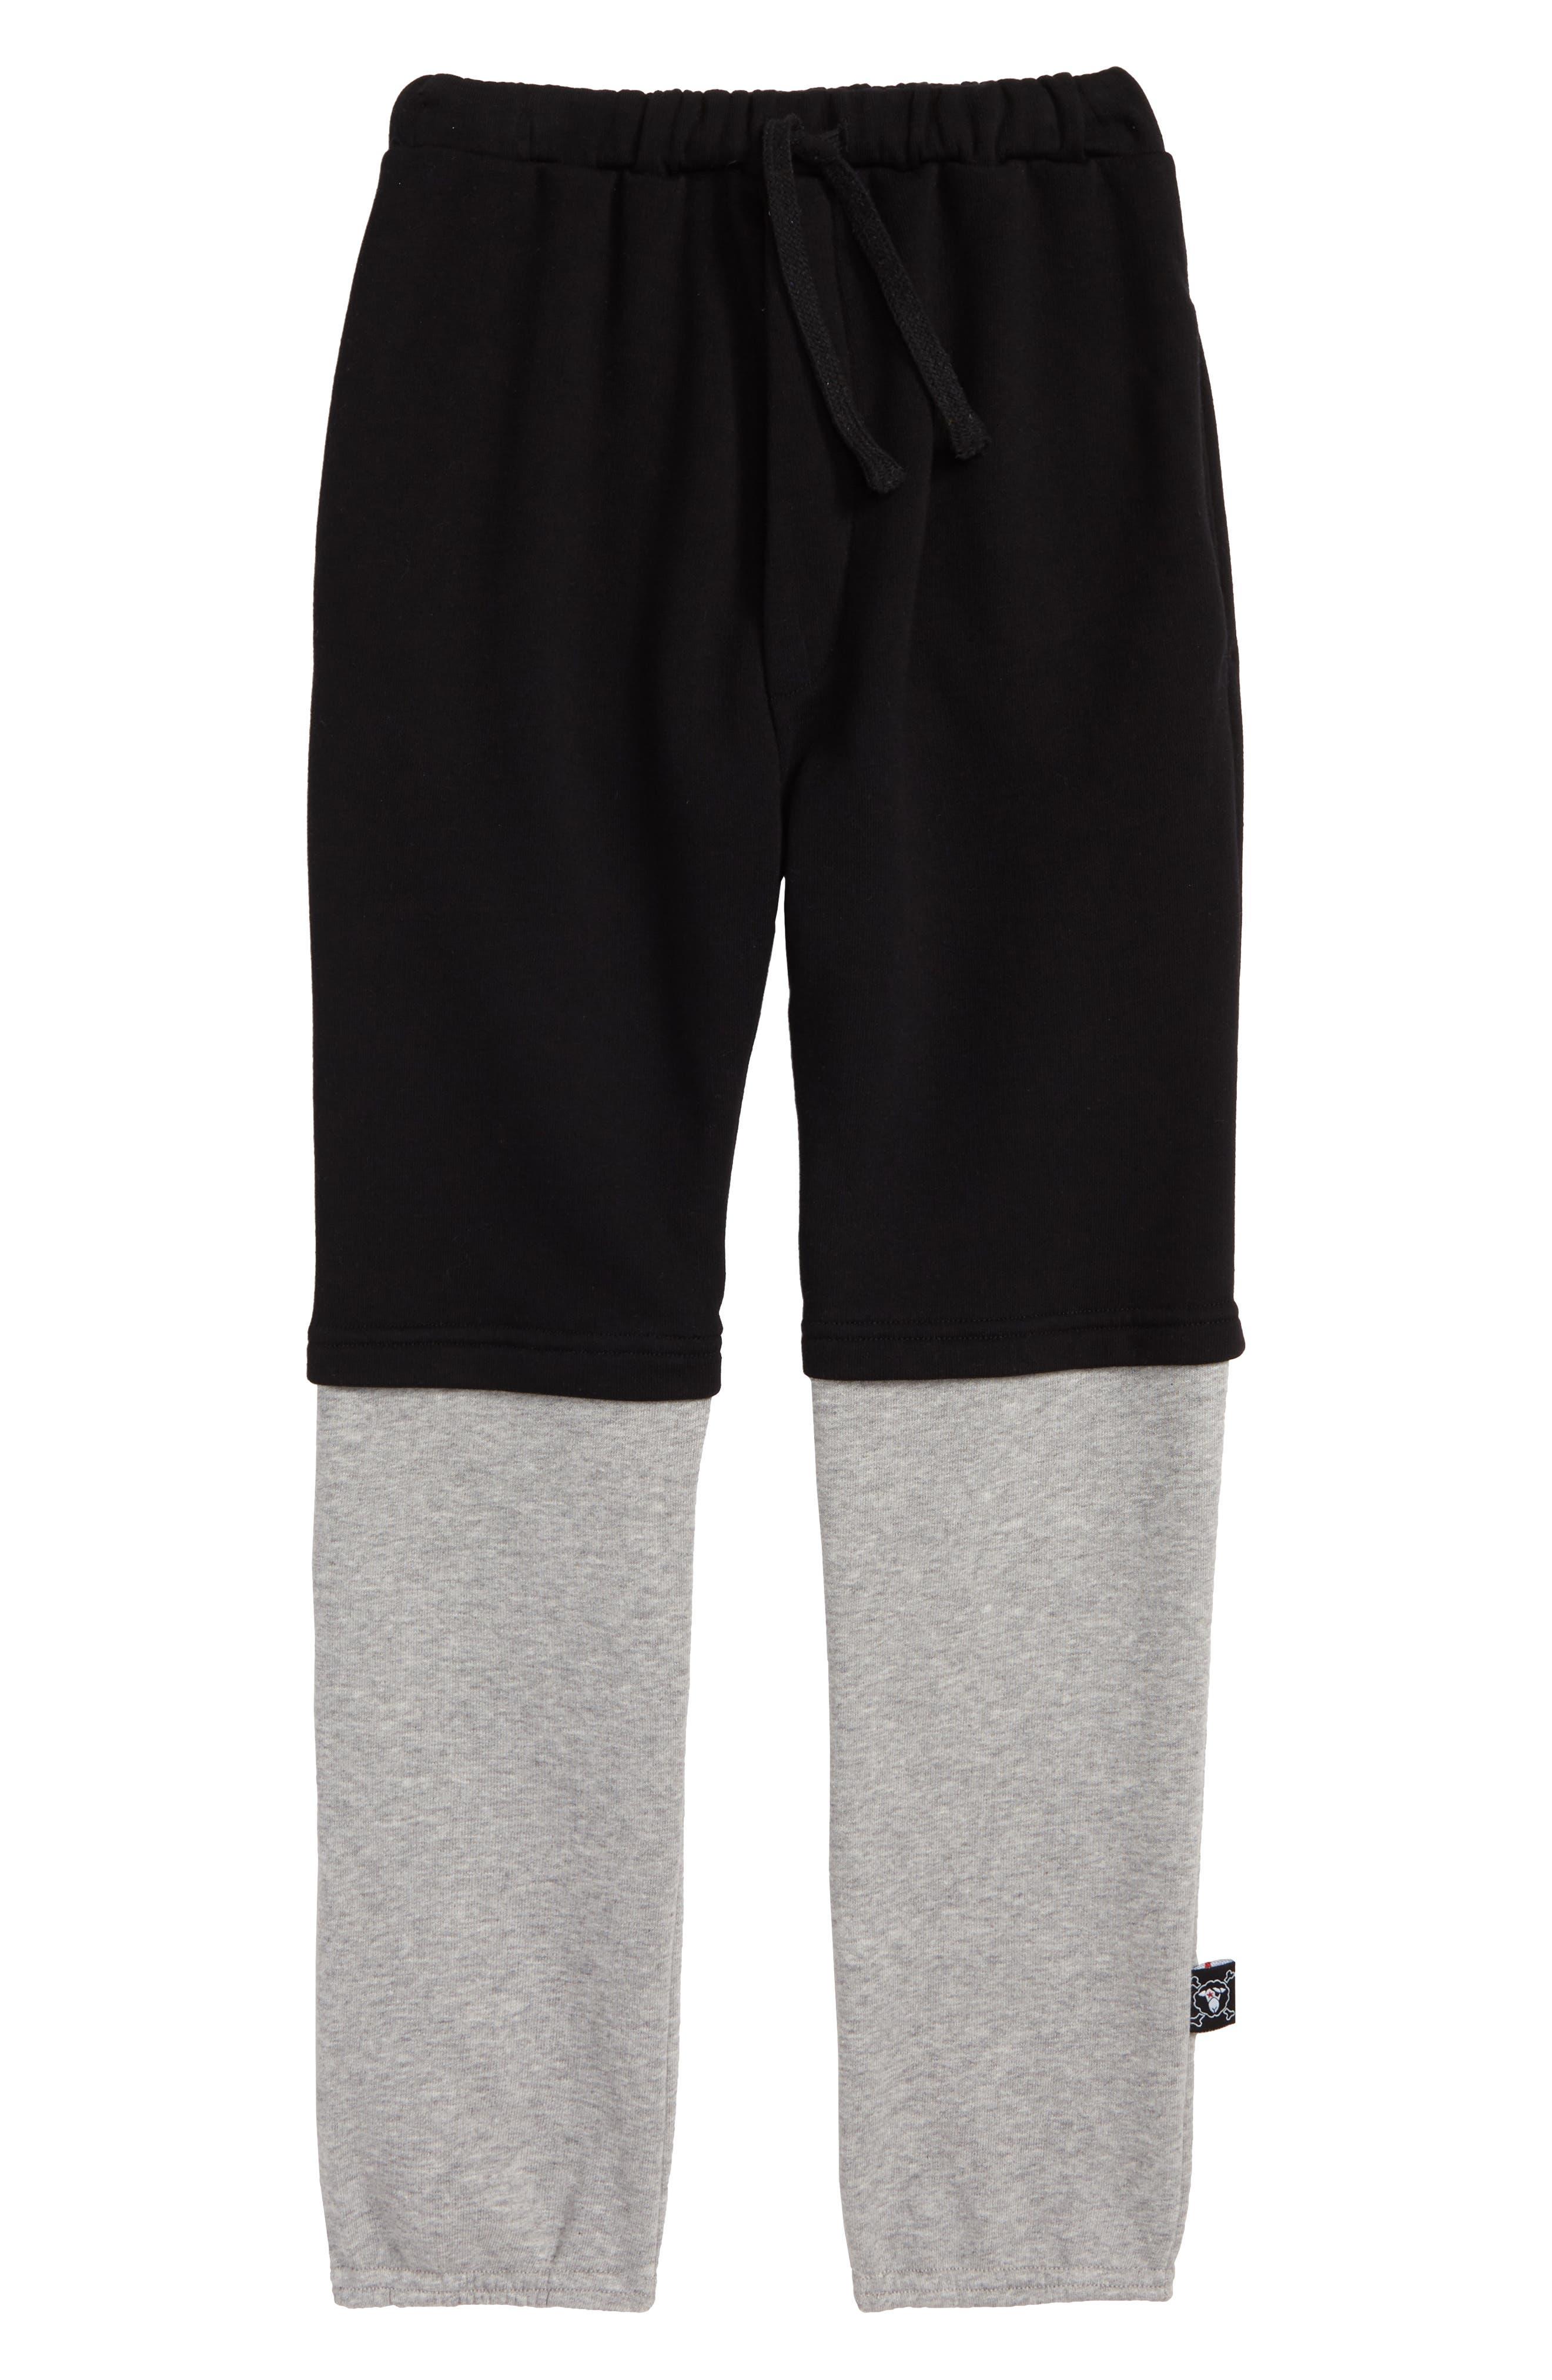 Double Sweatpants,                         Main,                         color, Black/ Heather Grey